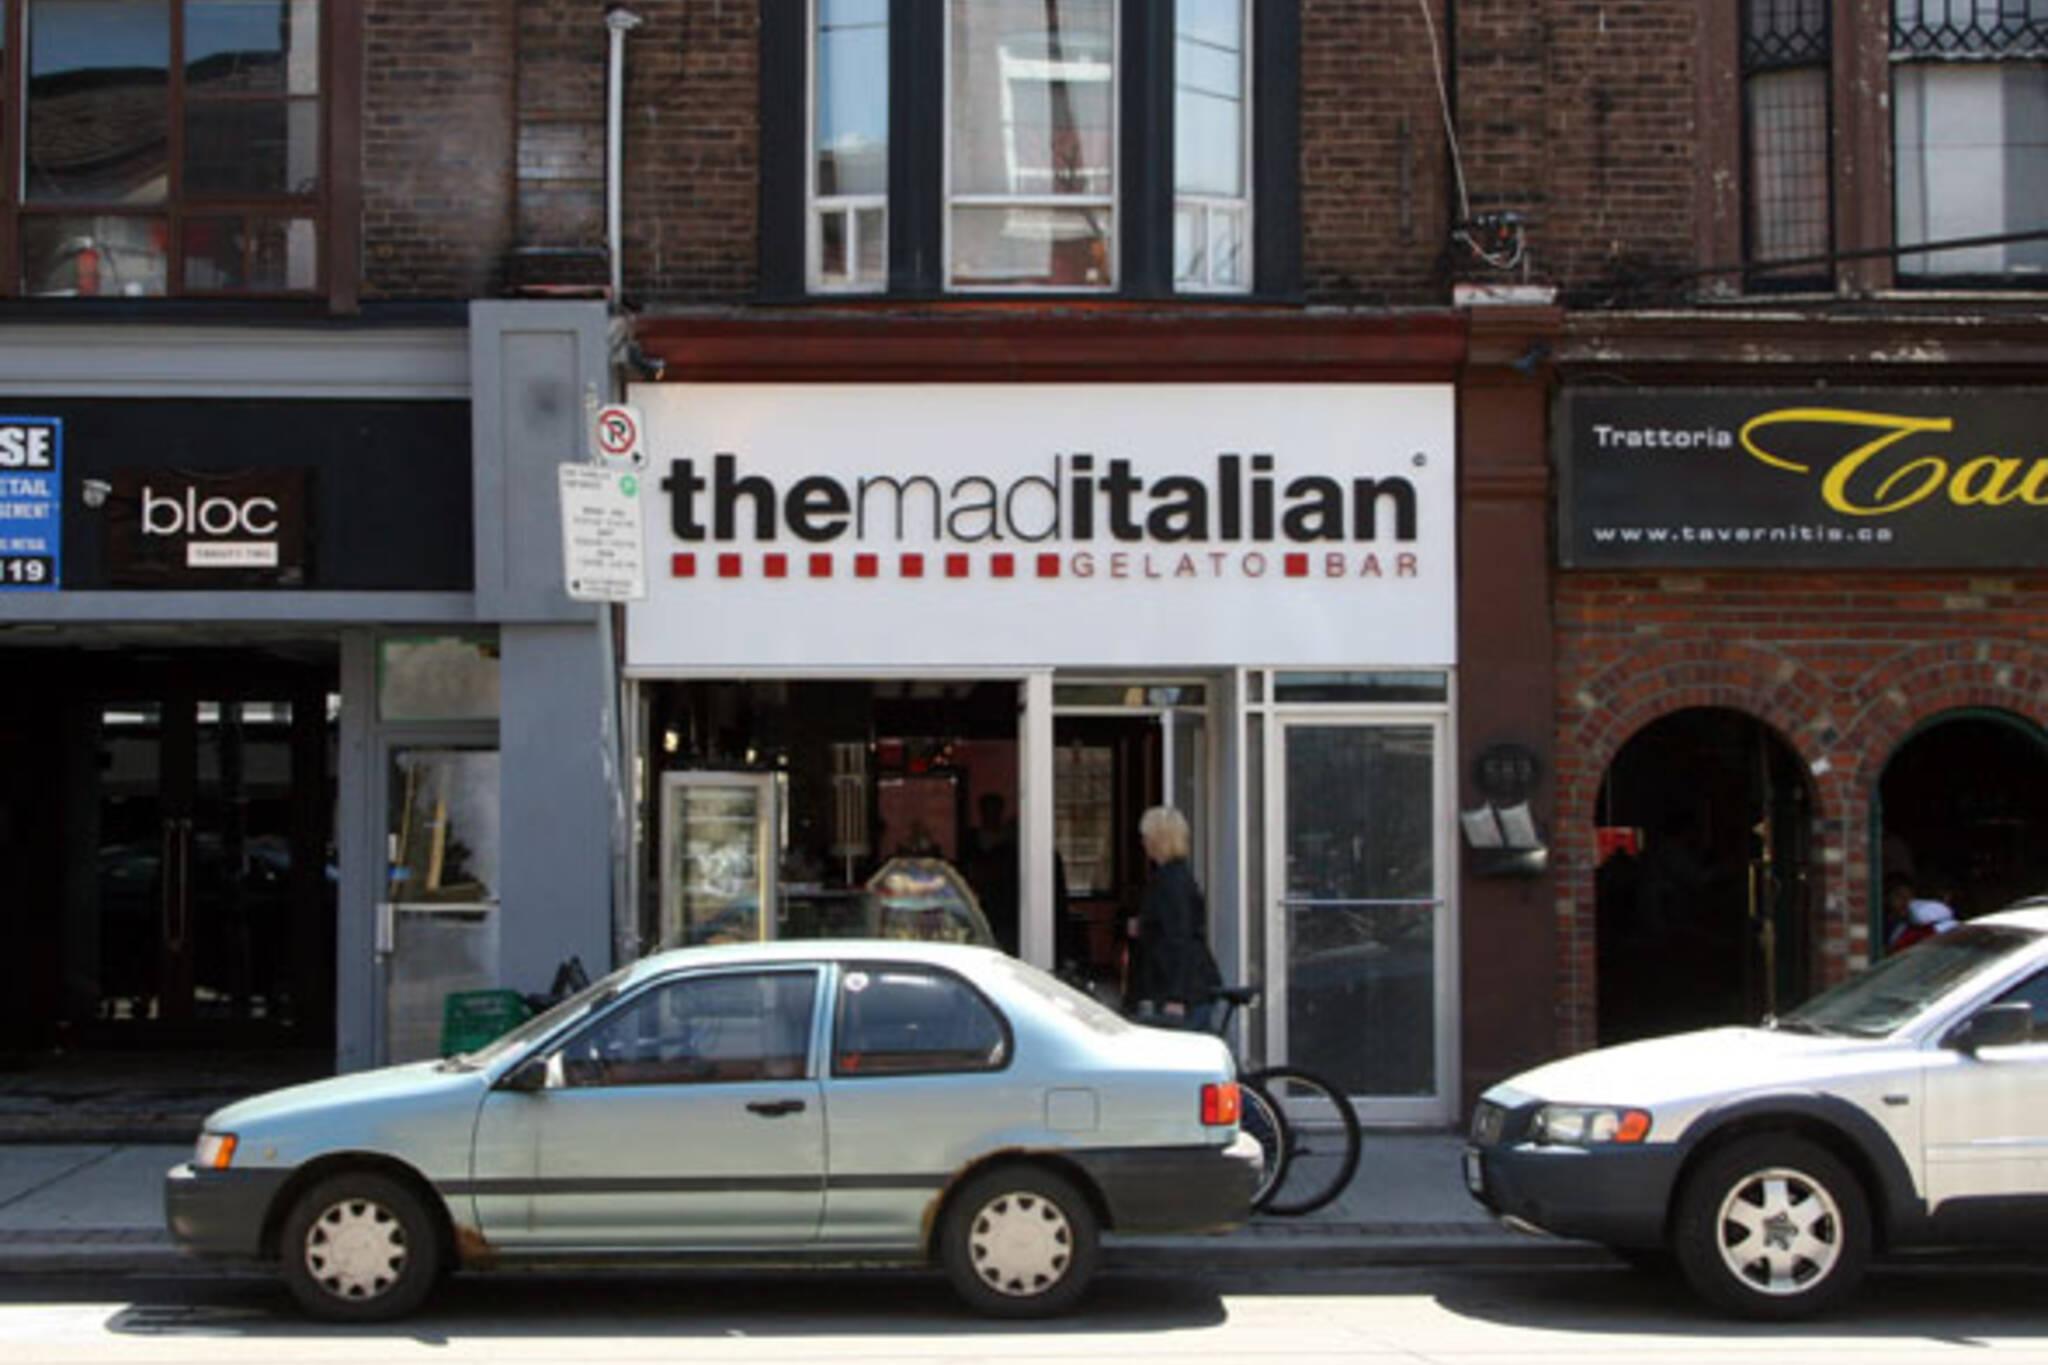 Mad Italian Gelato Bar